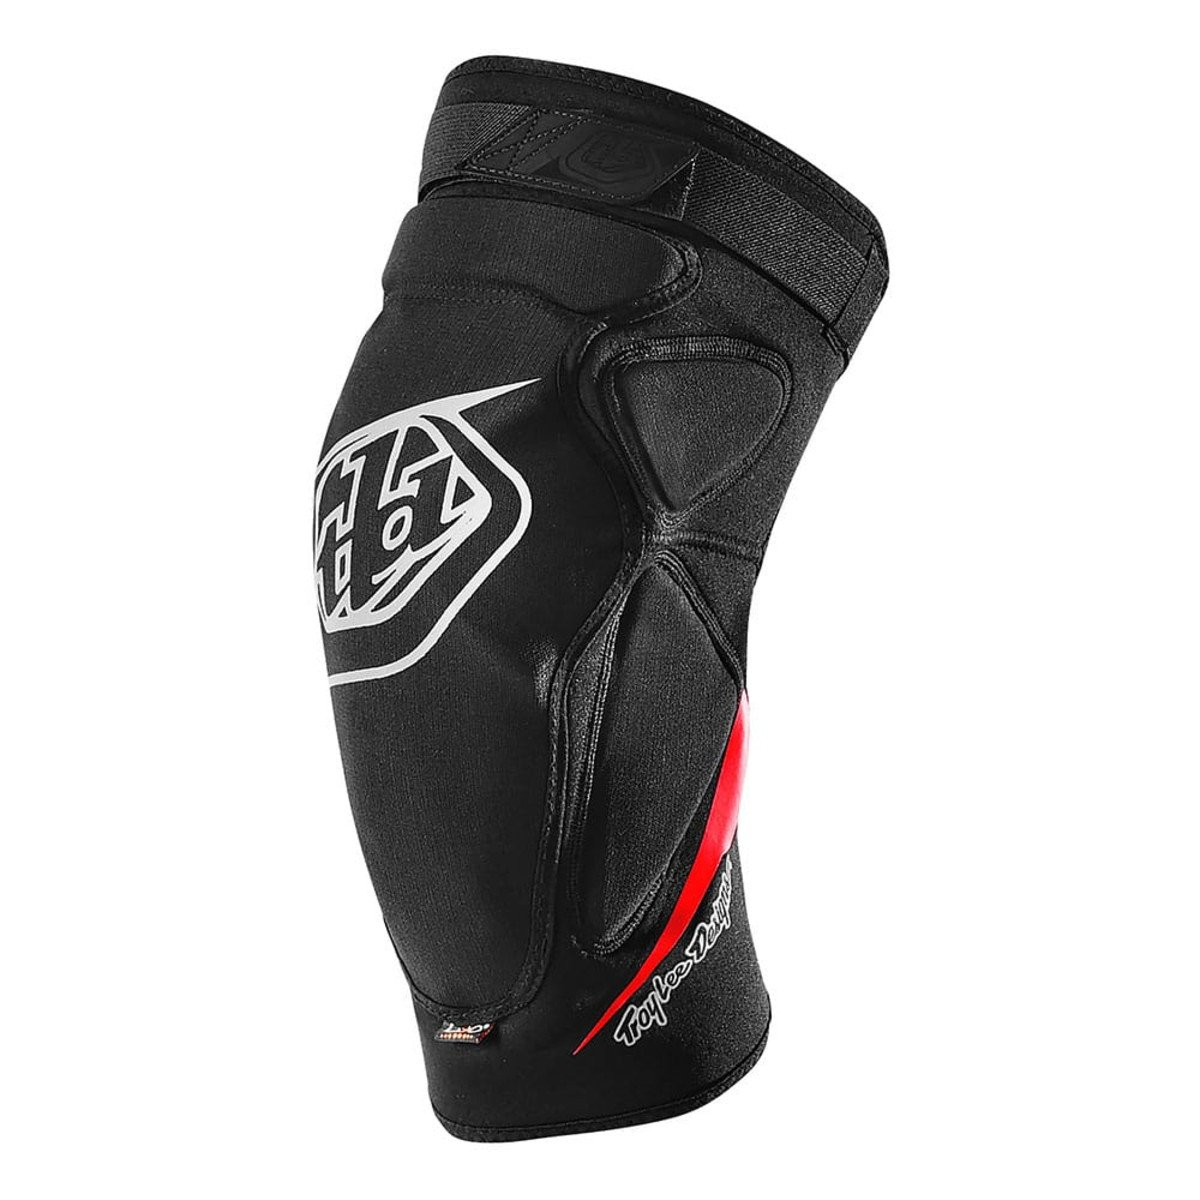 Troy Lee Designs Raid Knee Guard, Solid Black, XS-S